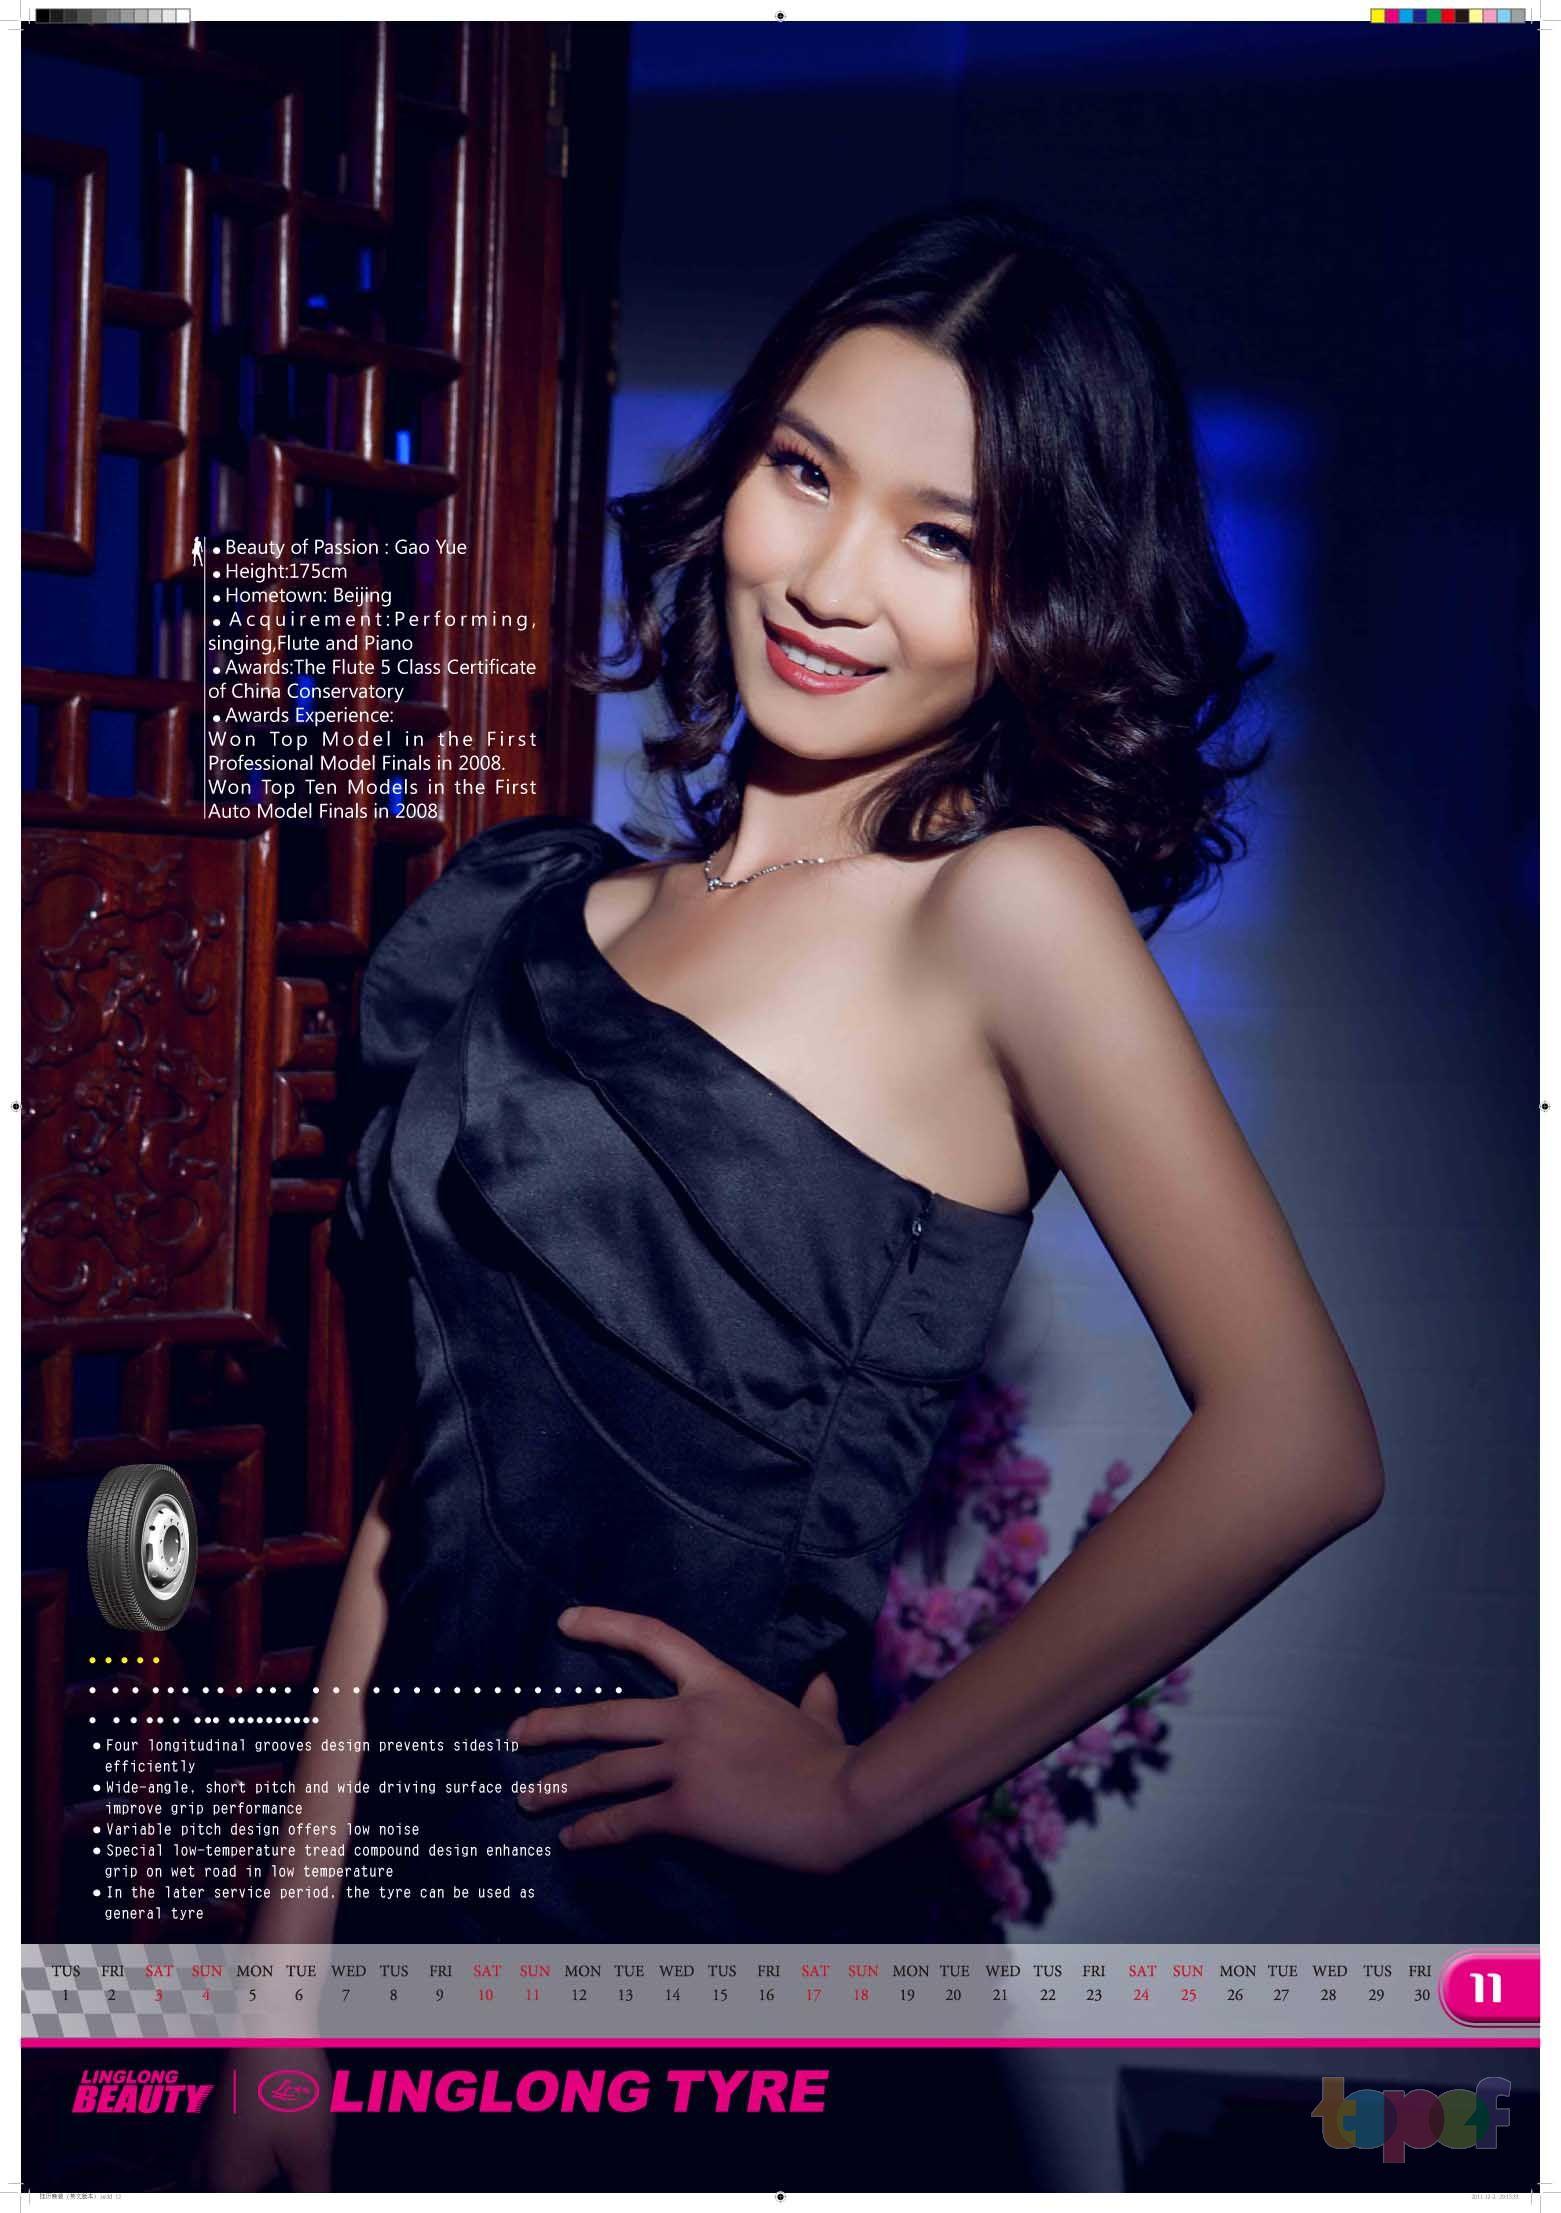 Календари от LingLong (Шины). Ноябрь 2012 года